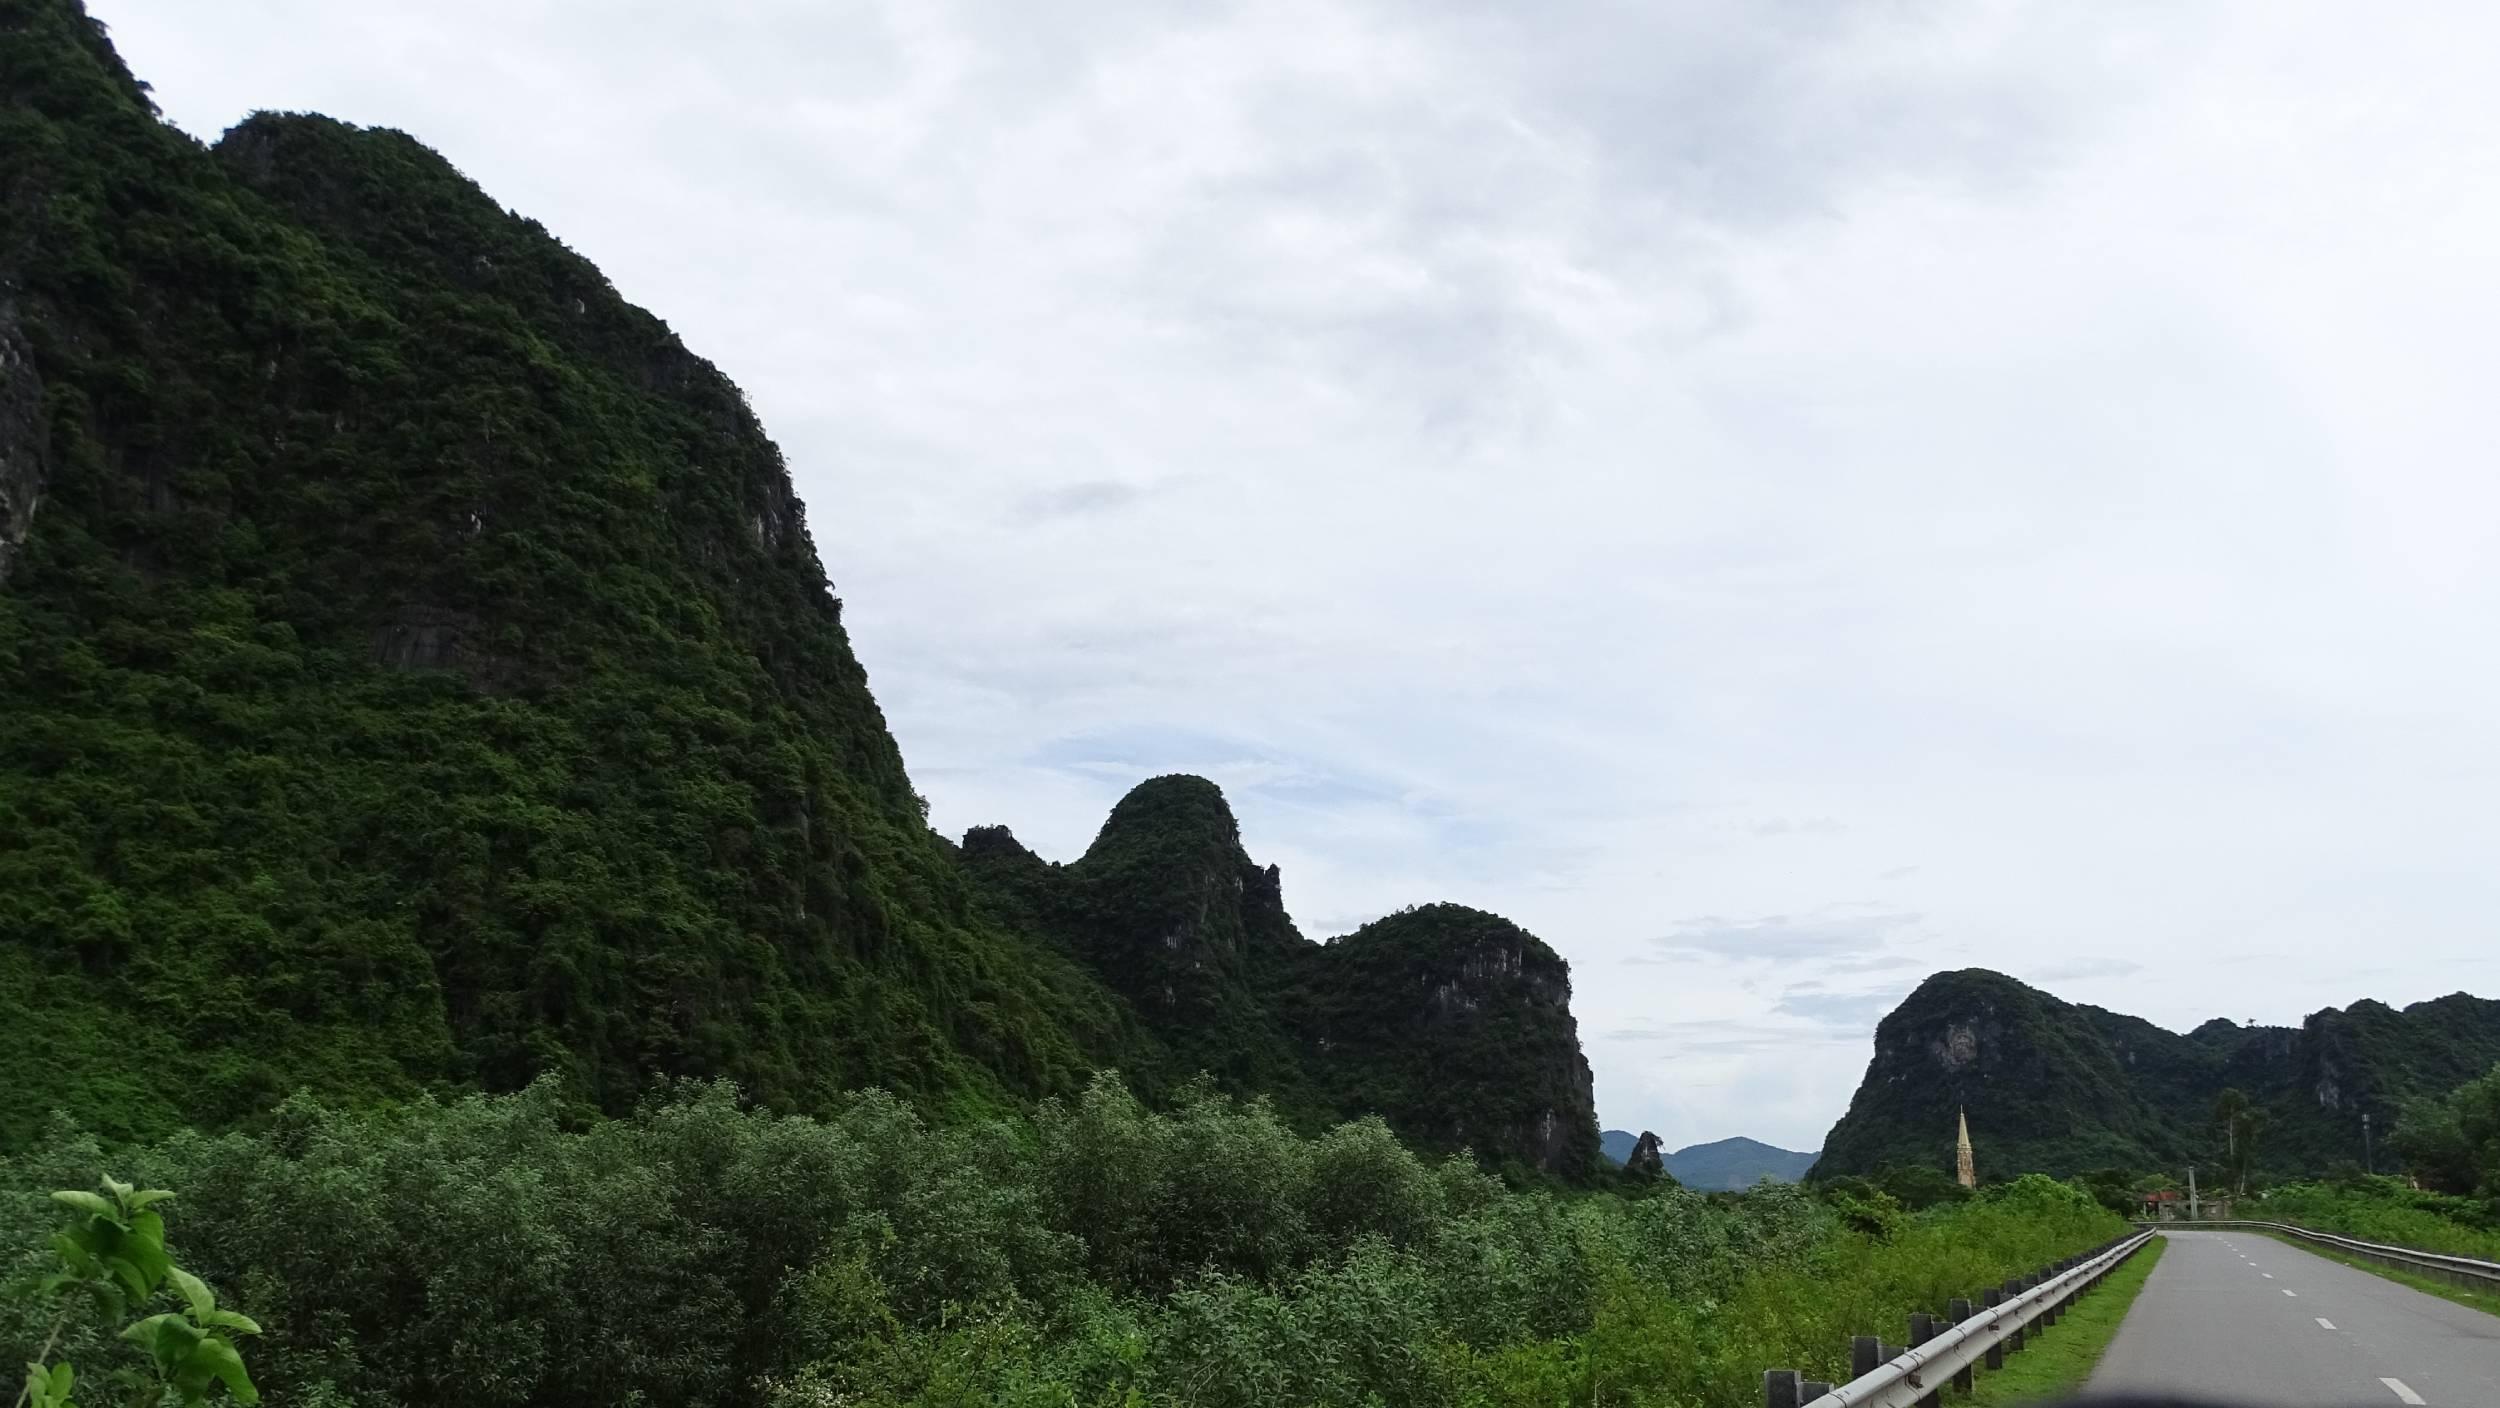 Karst rocks covered with greenery seen from the road to Phong Nha Ke Bang National Park